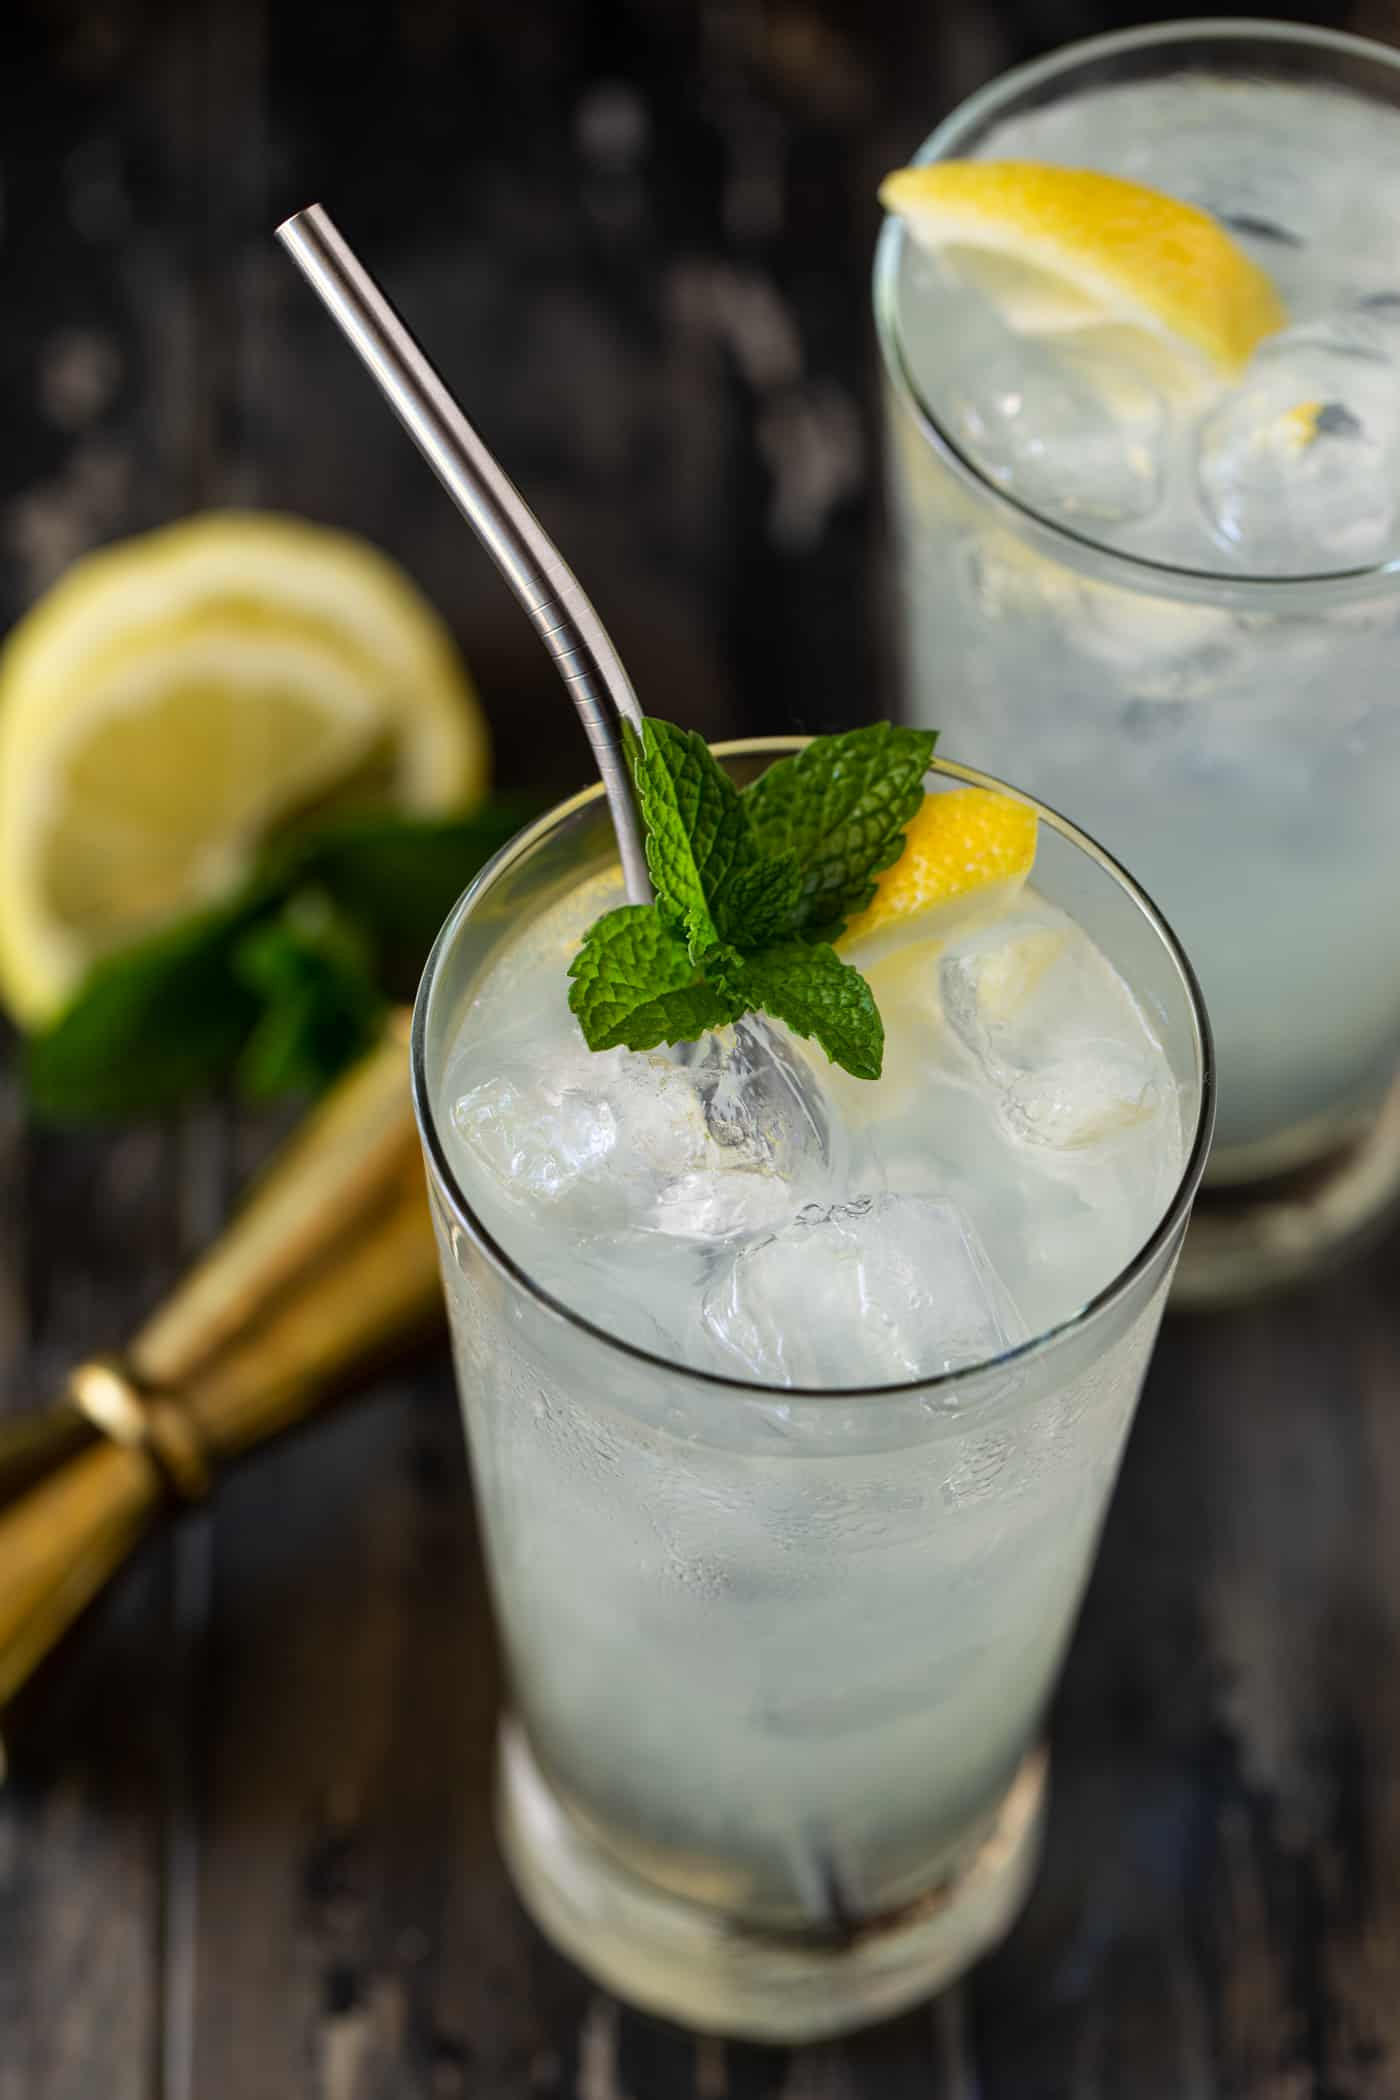 A glass of vodka lemonade with lemons.